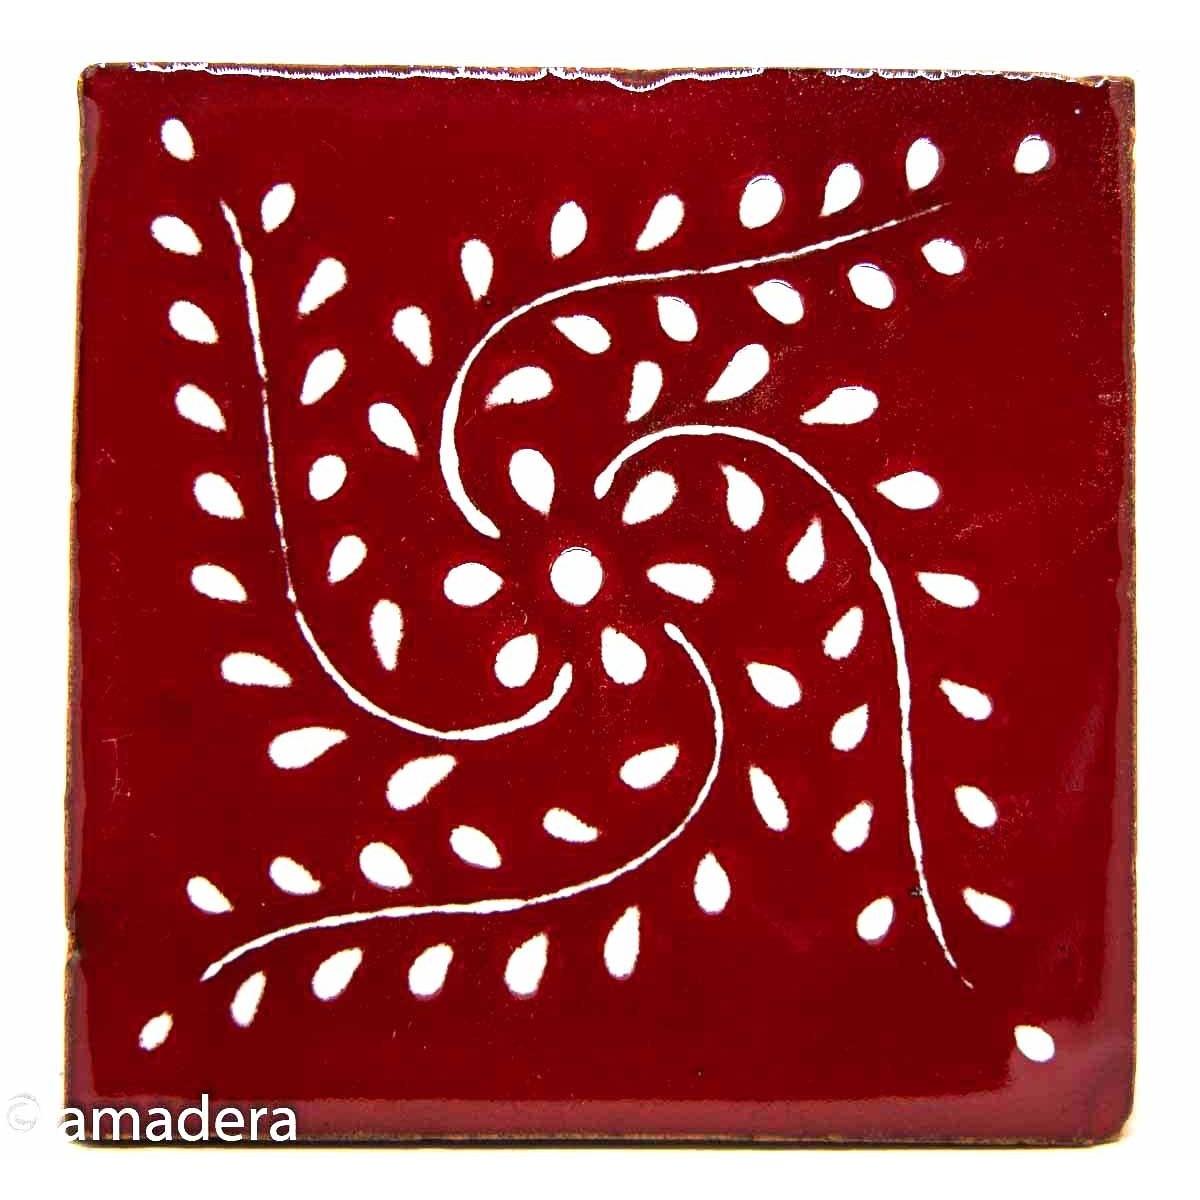 Azulejos mexicains amadera